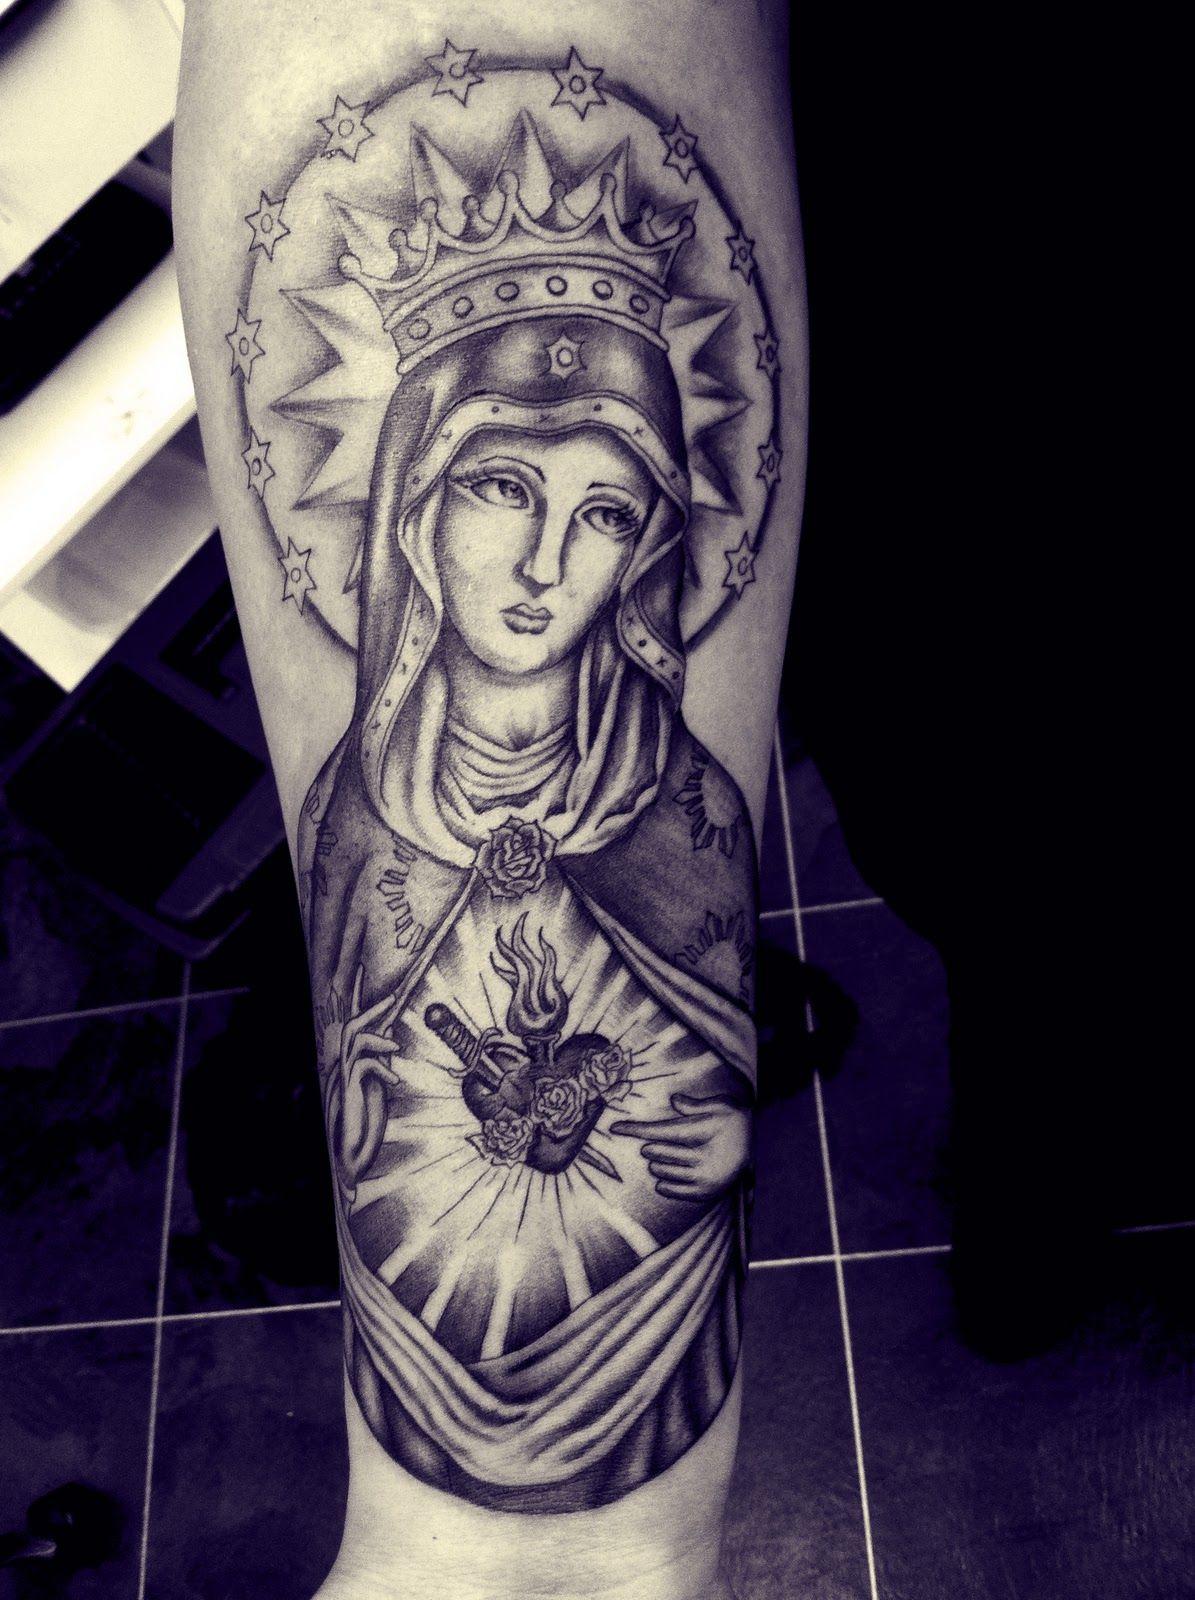 forearm sacred heart tattoos - Google Search | Tattoos I ...